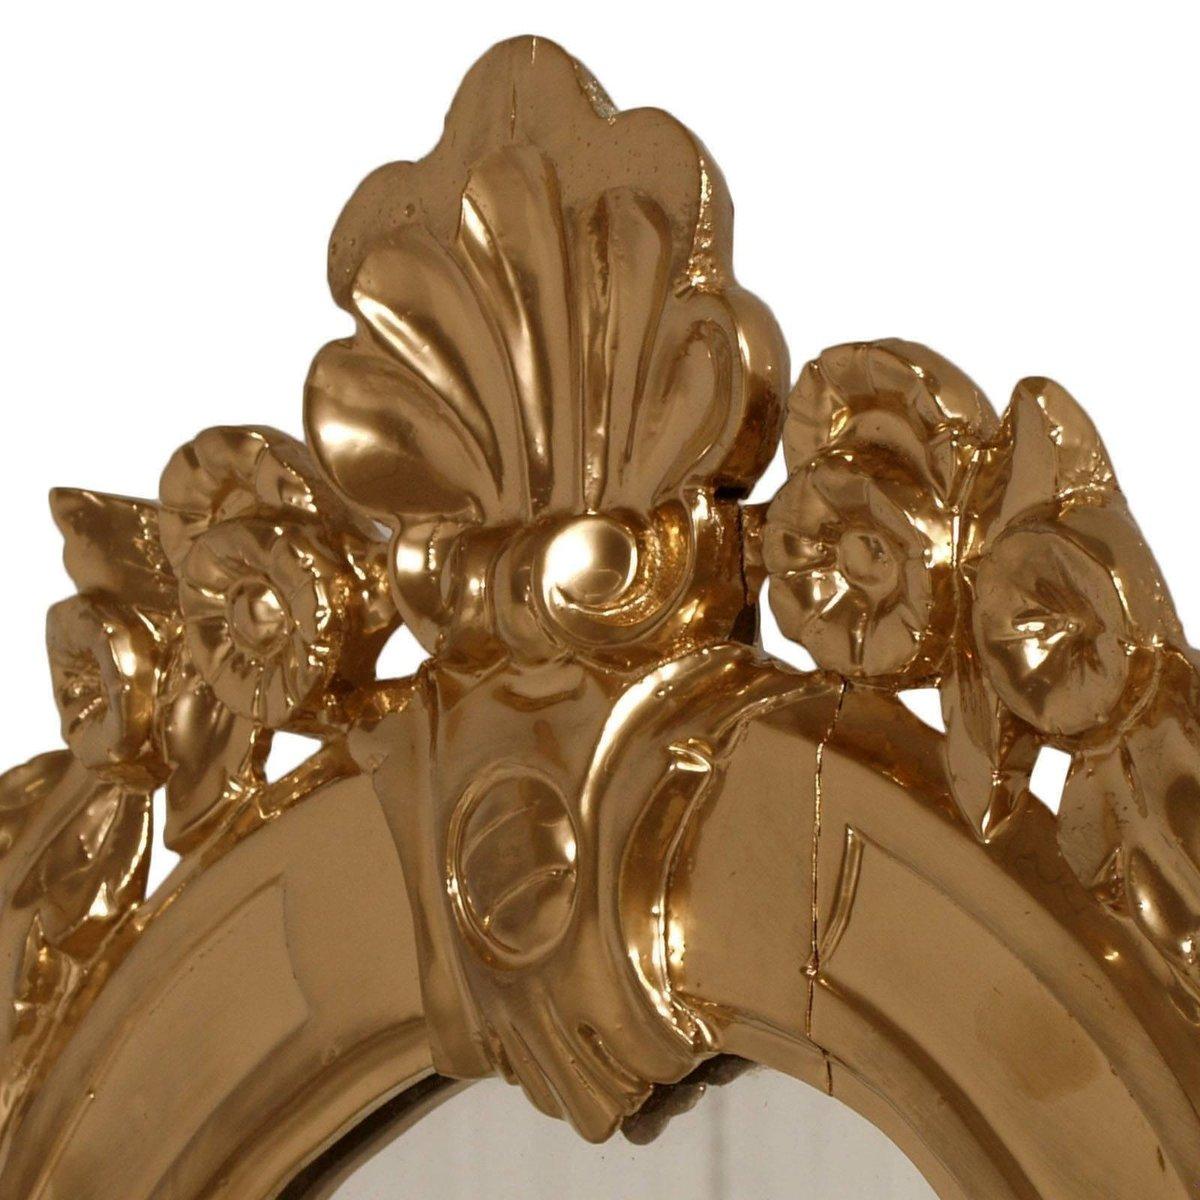 barocker wandspiegel mit goldenem rahmen aus. Black Bedroom Furniture Sets. Home Design Ideas